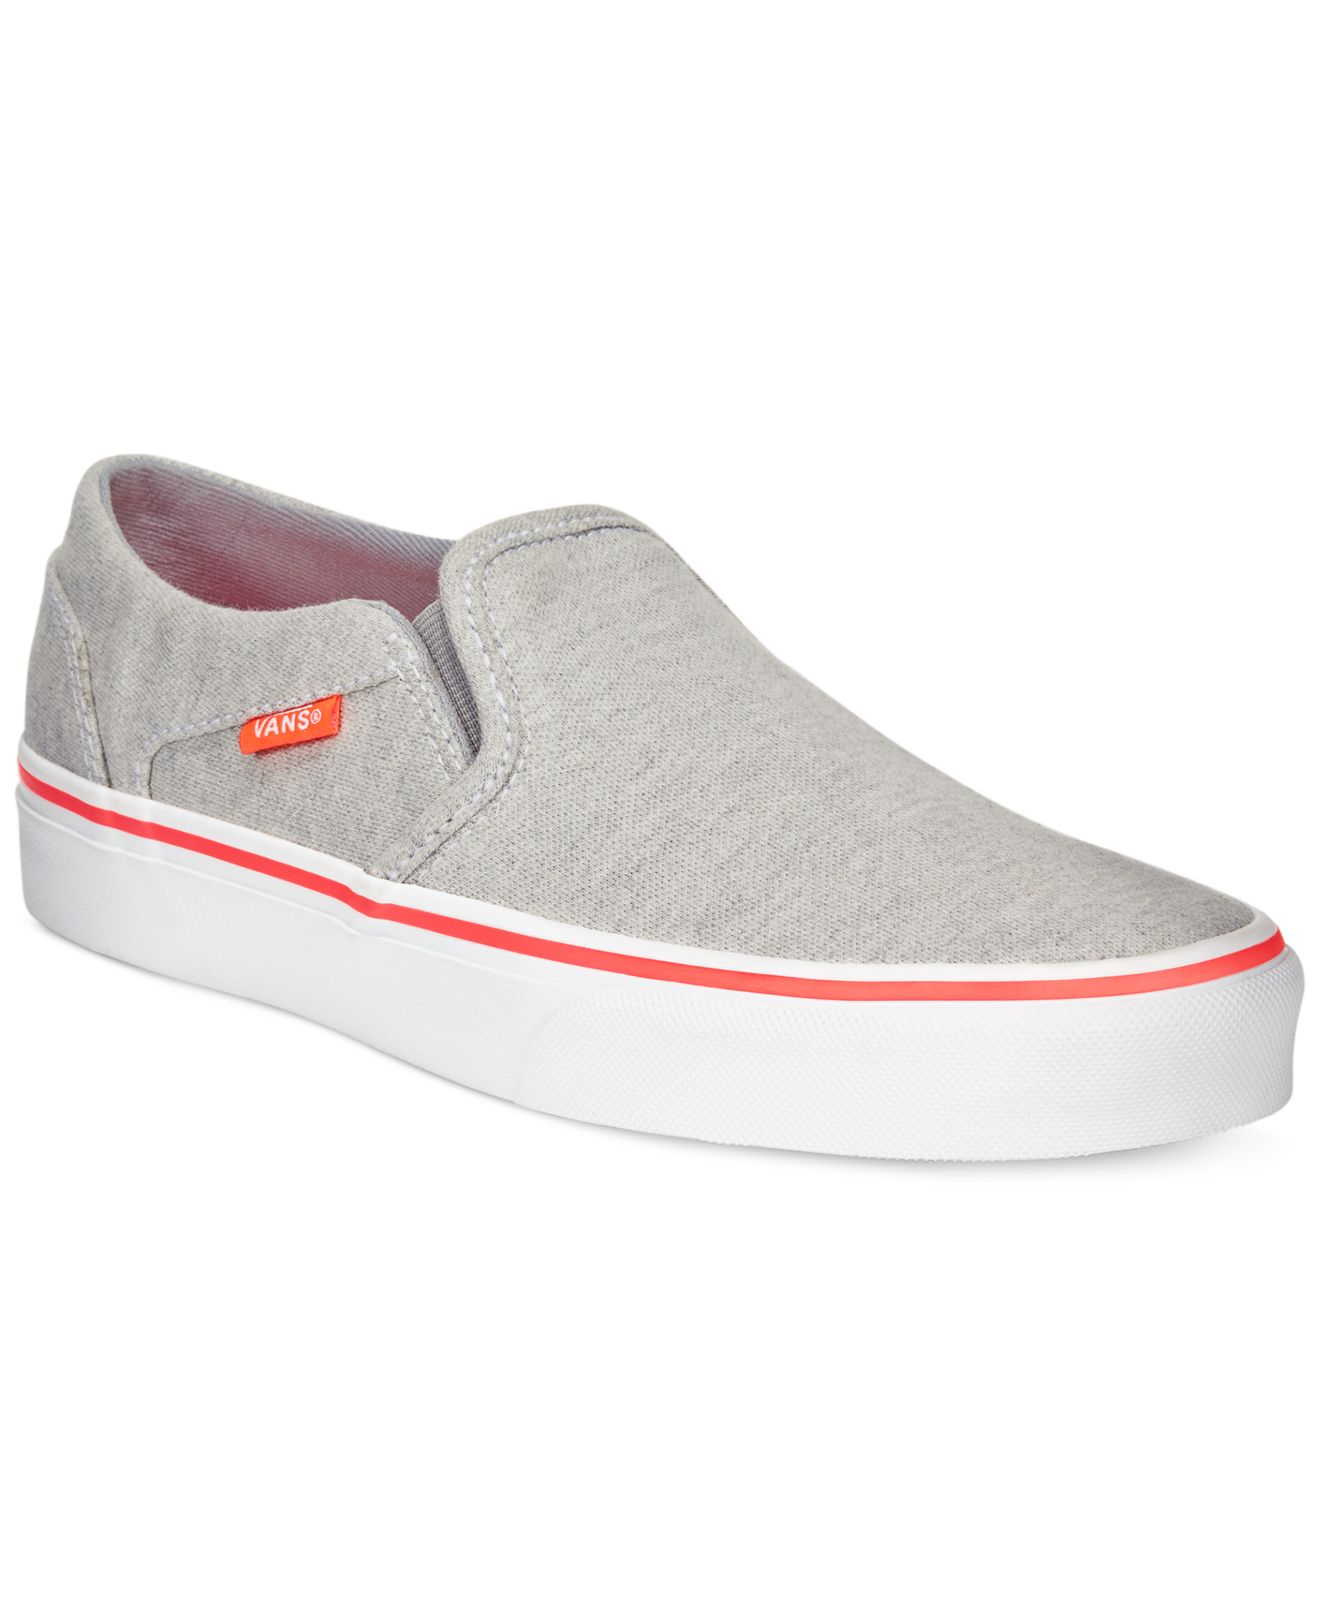 bafa3c6445 Lyst - Vans Women s Asher Classic Slip-on Sneakers in Gray